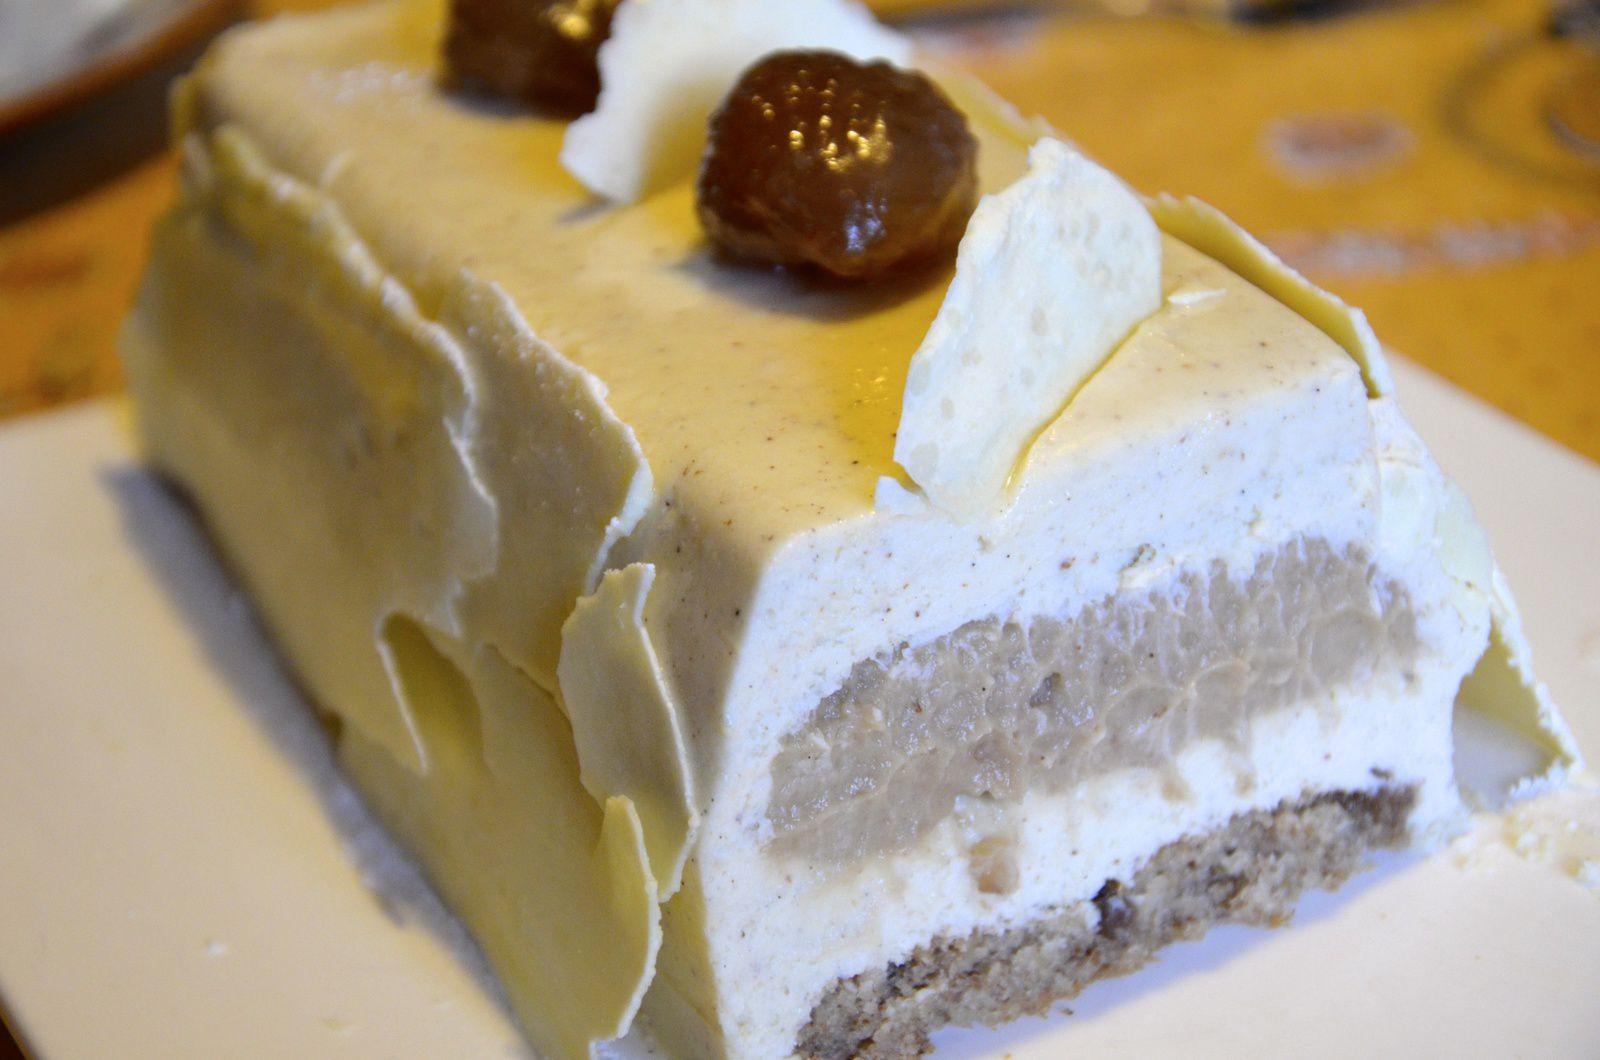 B che vanille marron la p 39 tite cuisine de pauline for Buche de noel chocolat marron